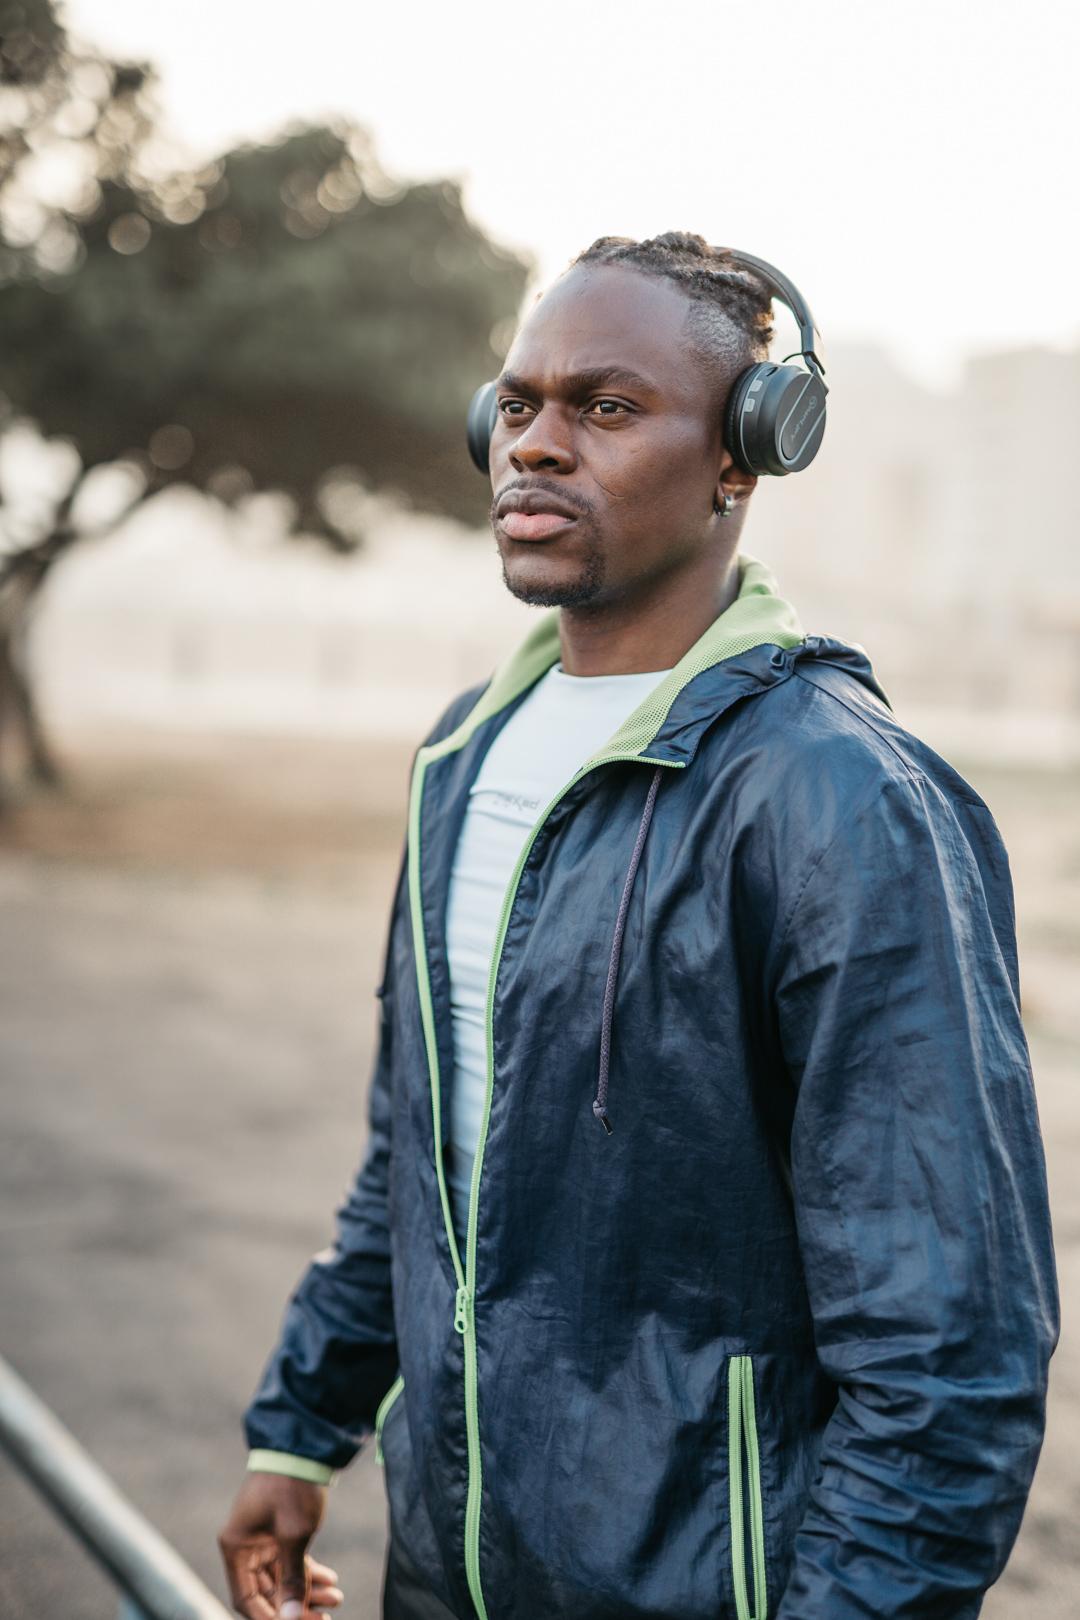 Fitness Portrait Photography Jose Bin - Cape Town Model - by Cape Image Co-1.jpg